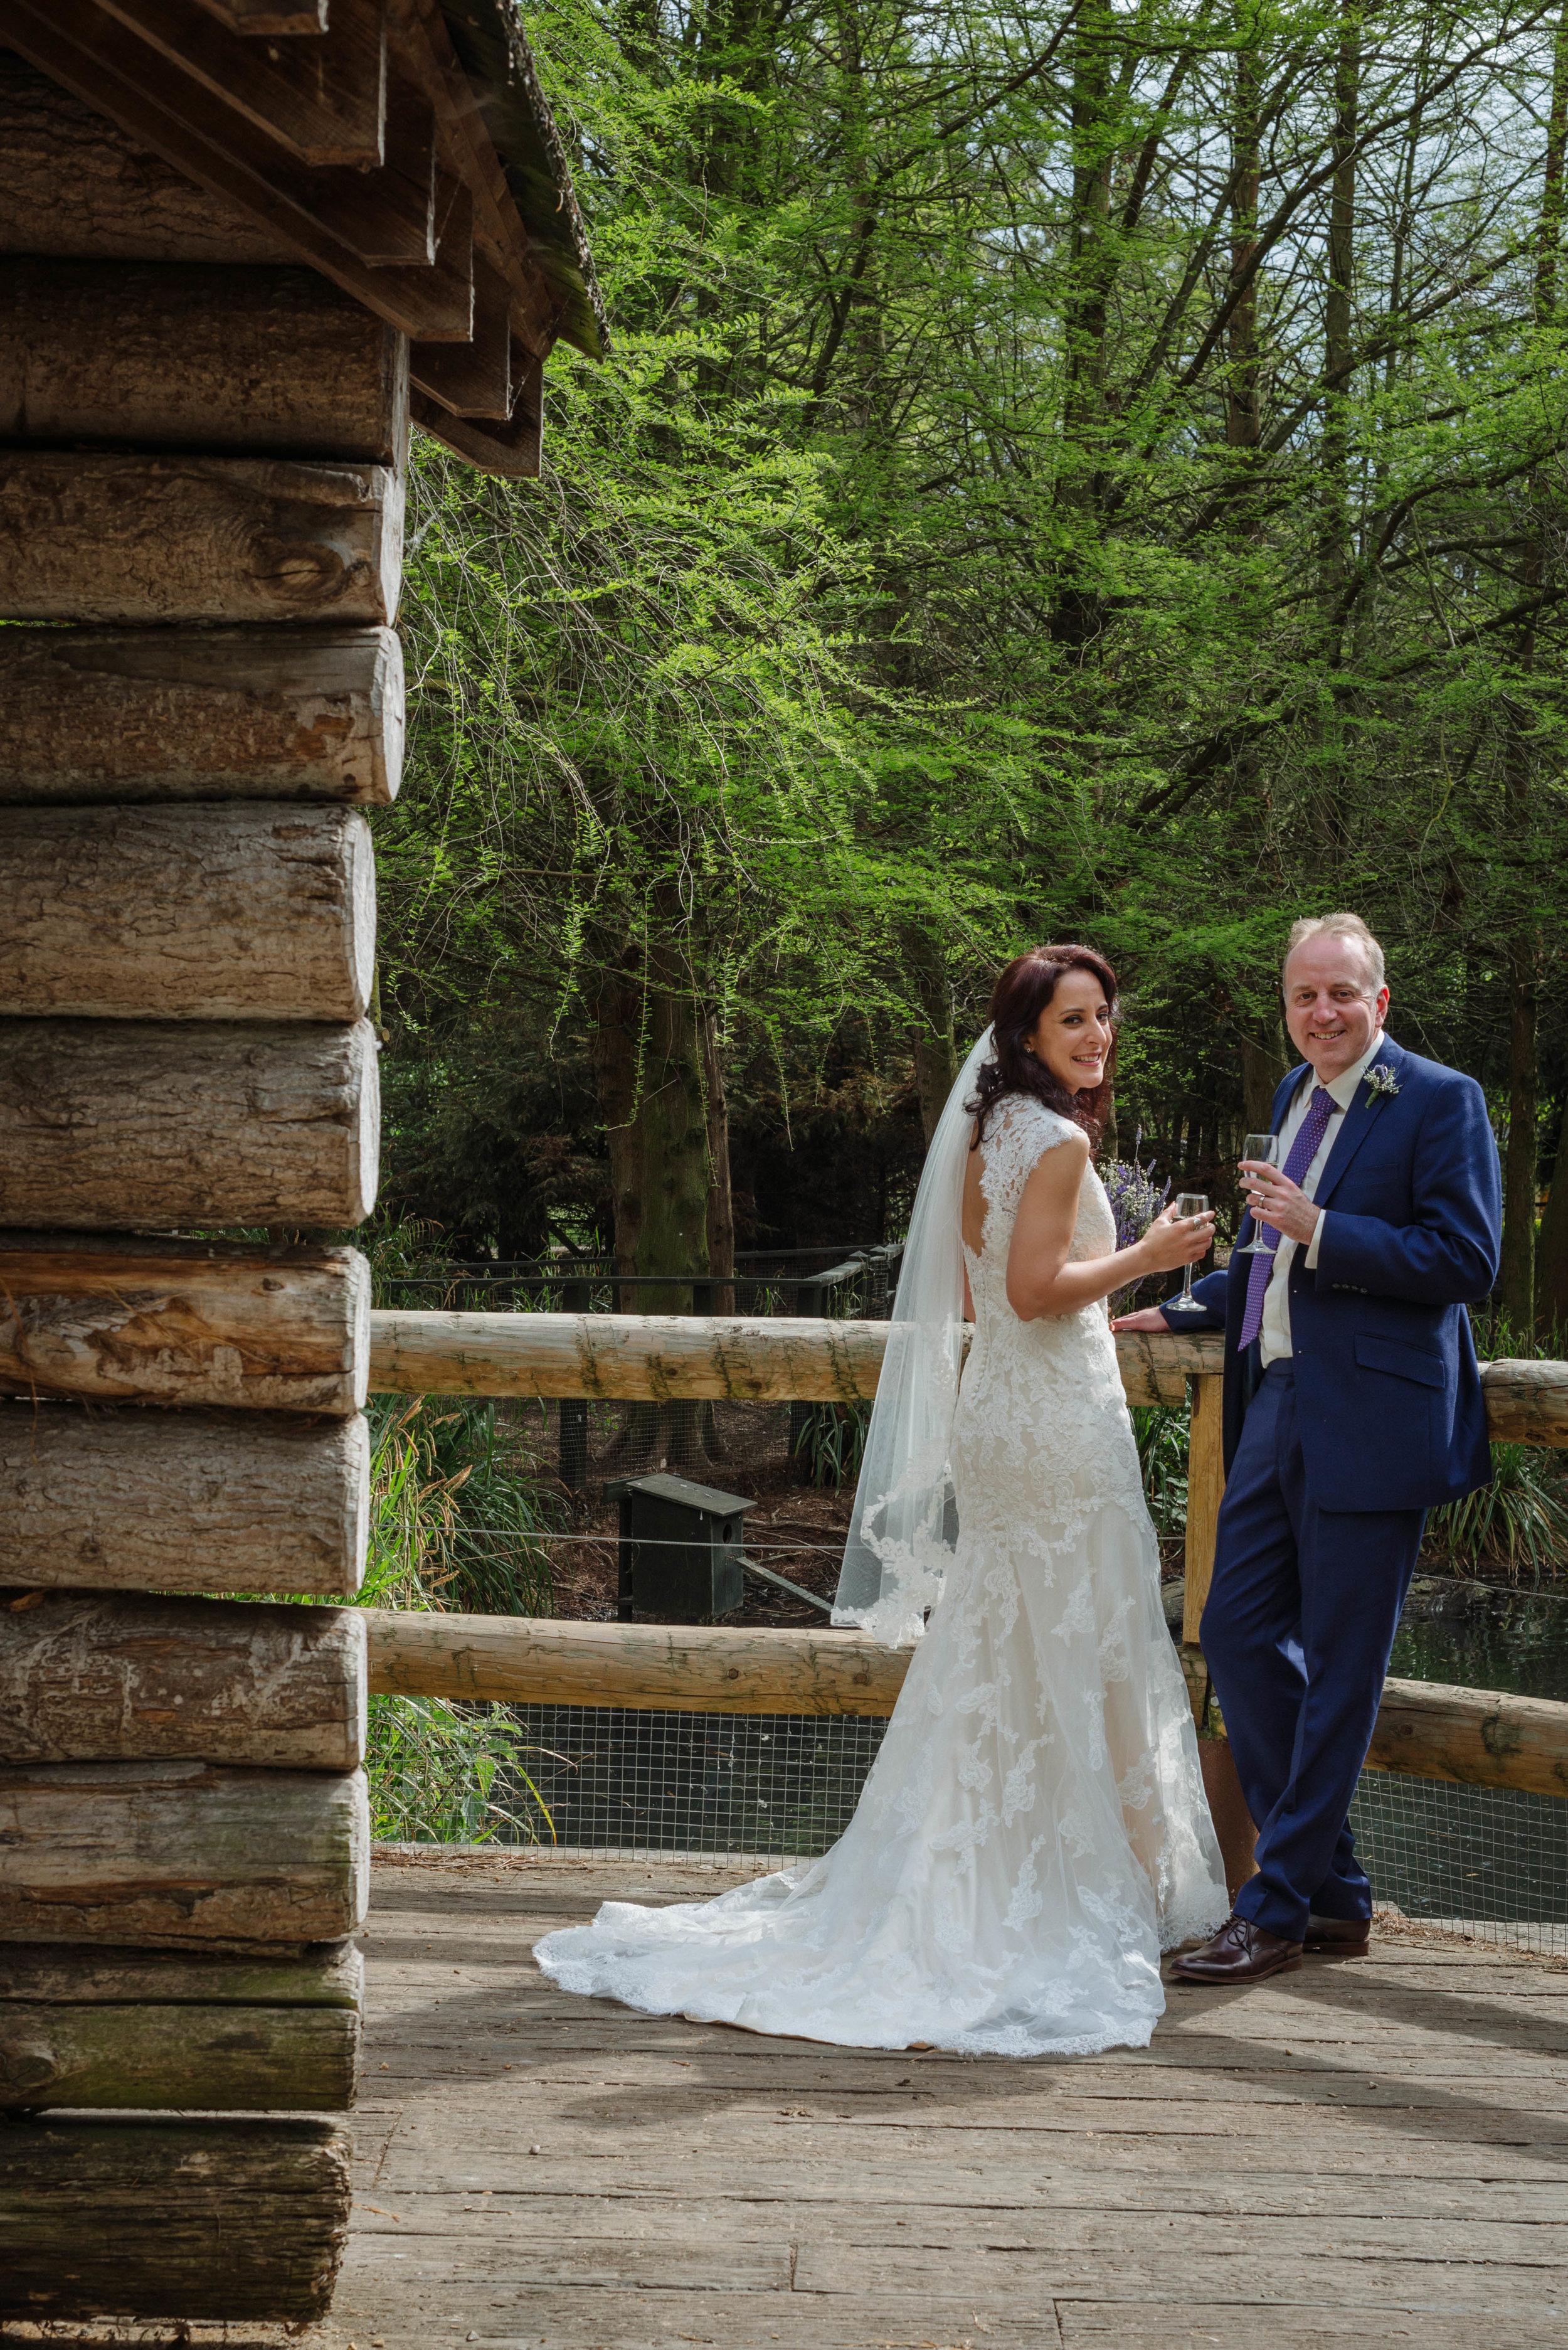 blue-bright-wedding-suit-british-made-uk-brook-taverner-cloth-bride-groom.jpg